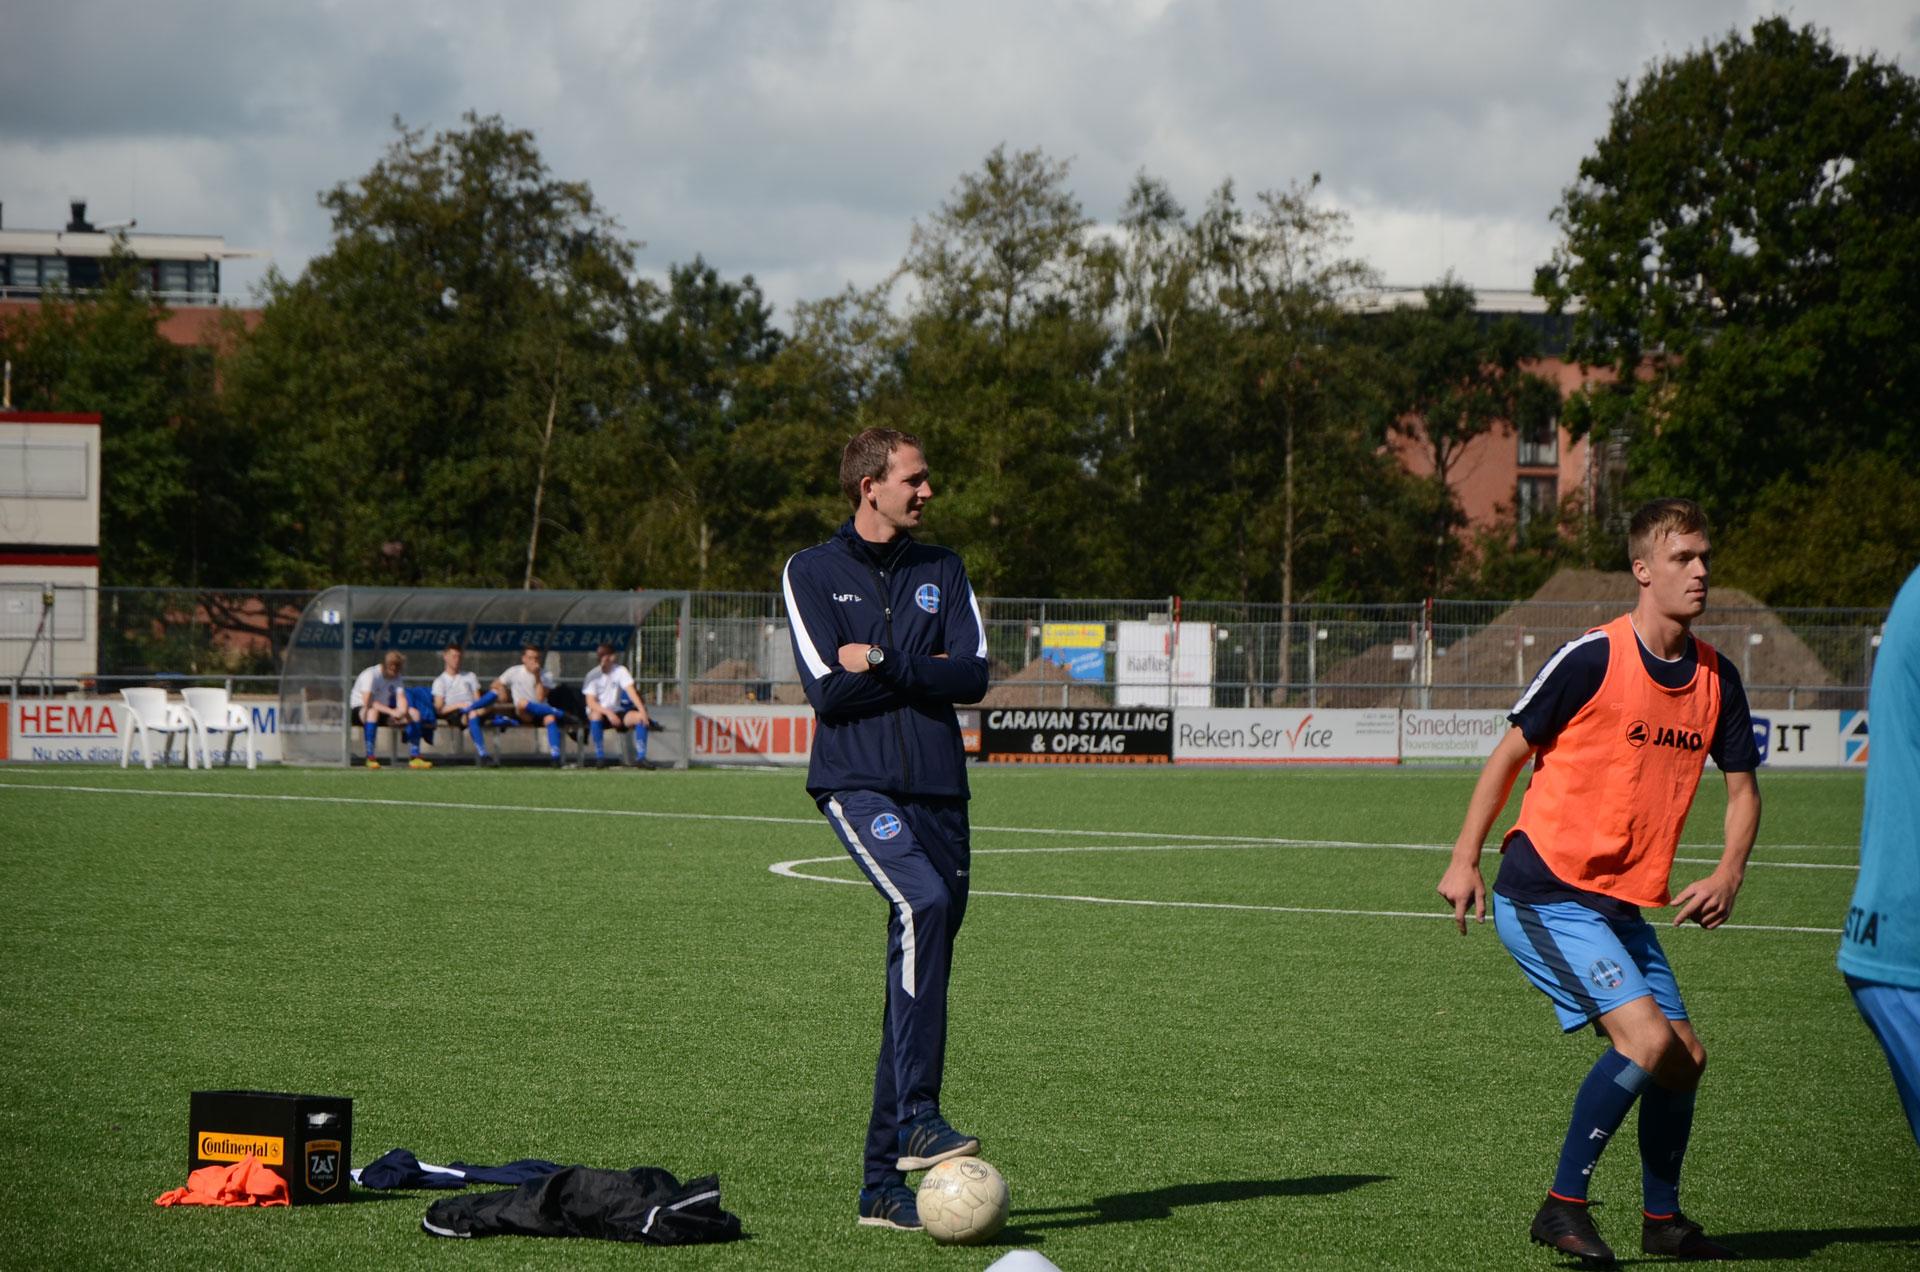 Niels Pot ook volgend seizoen trainer bij FC Burgum